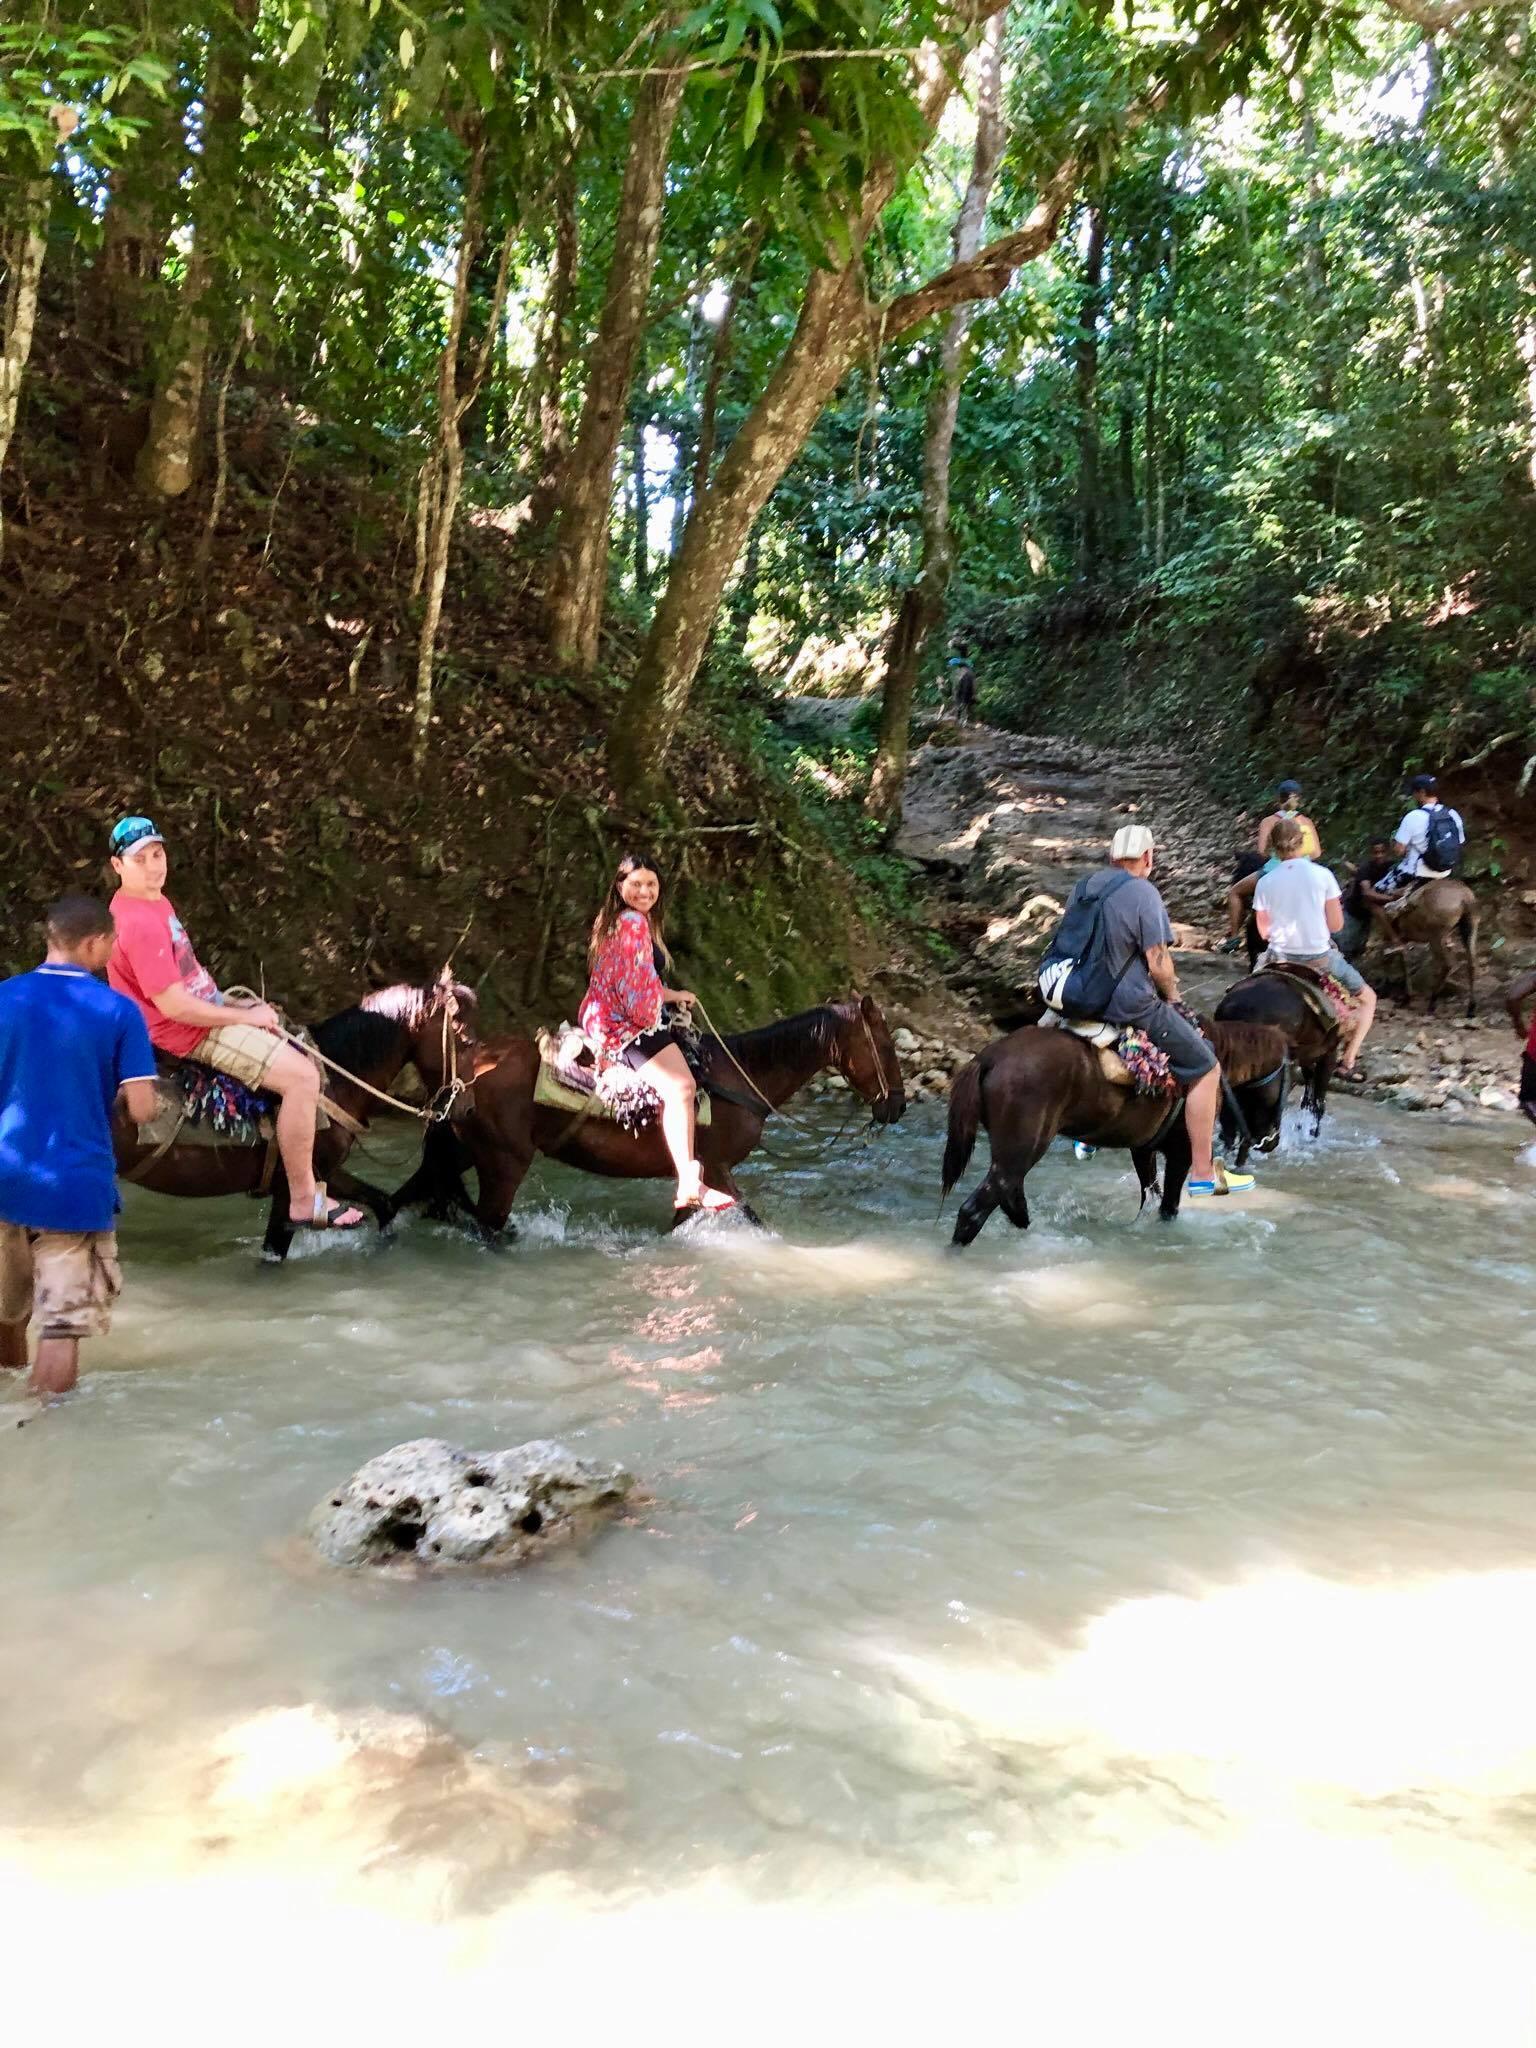 Liveaboard Life Day 274: Horseback Riding in Samana, DomRep